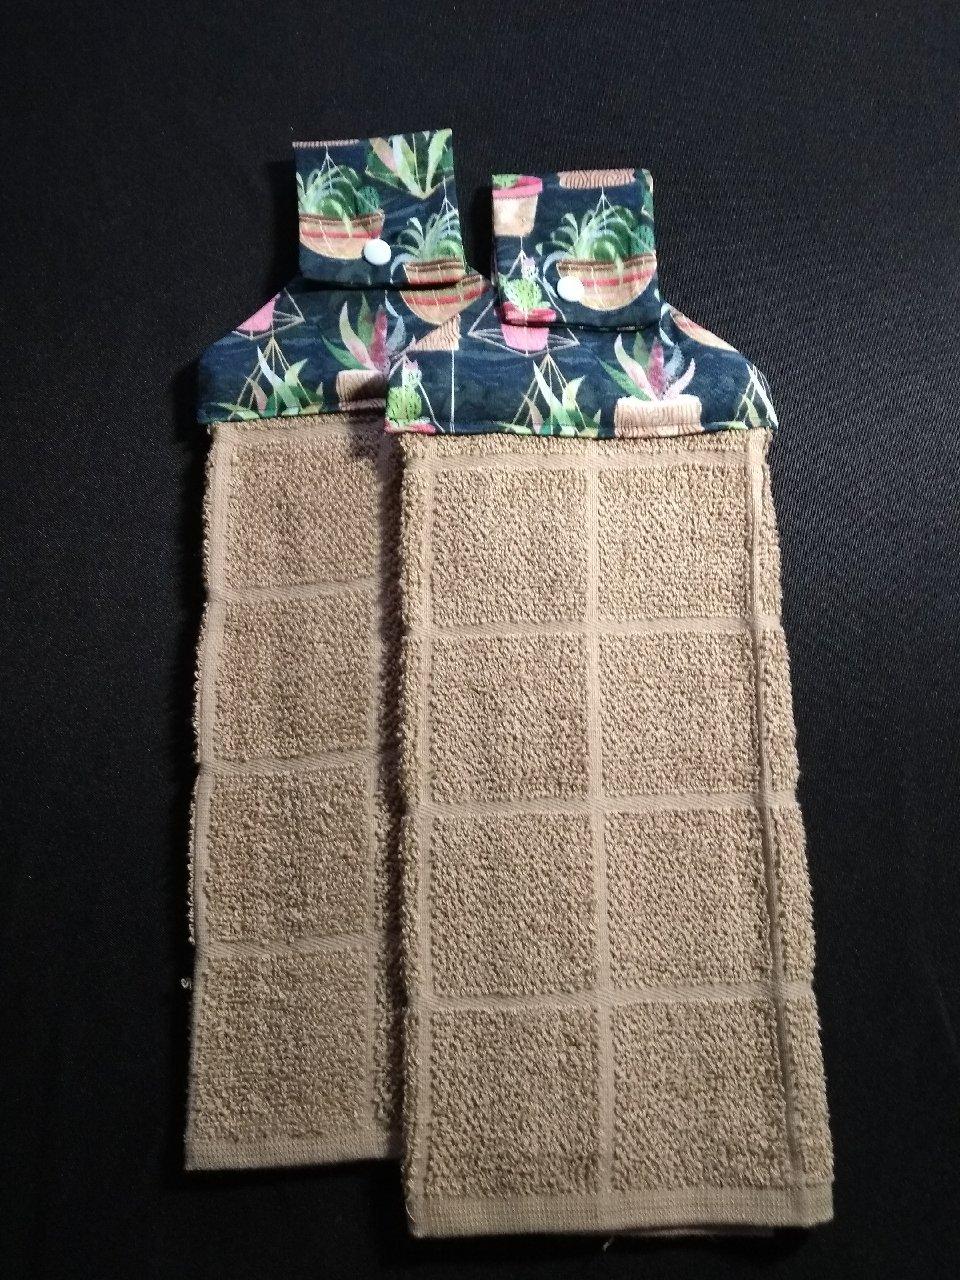 Amazon com: Southwest Succulents Hanging Dish Towels (Set of